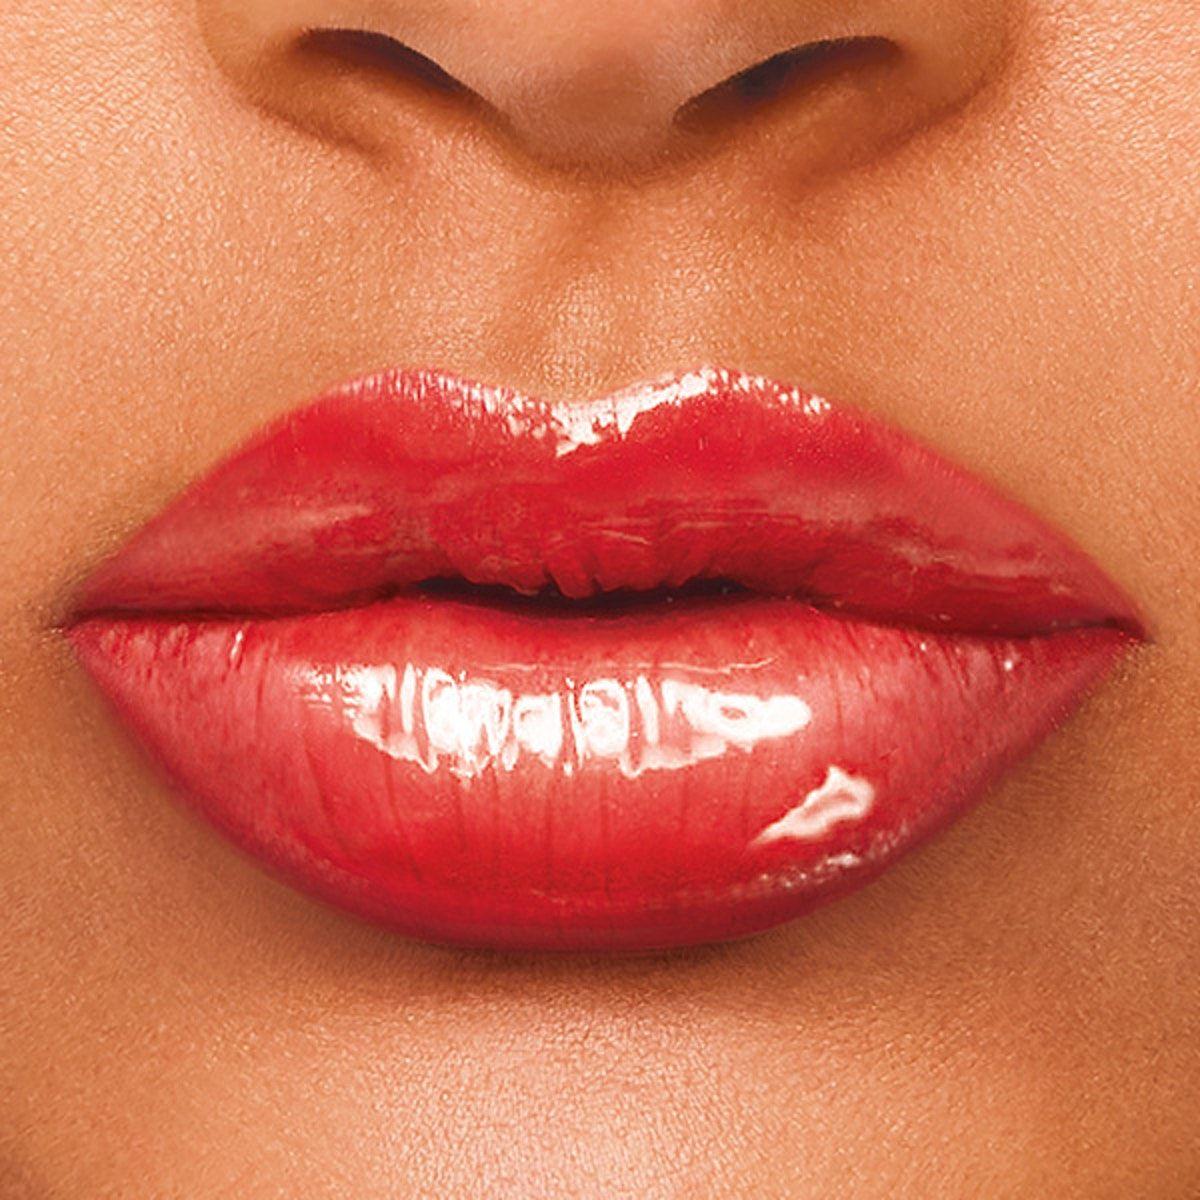 Avon True Color Lip Glow Lip Gloss Makeup Lipgloss Lipstick